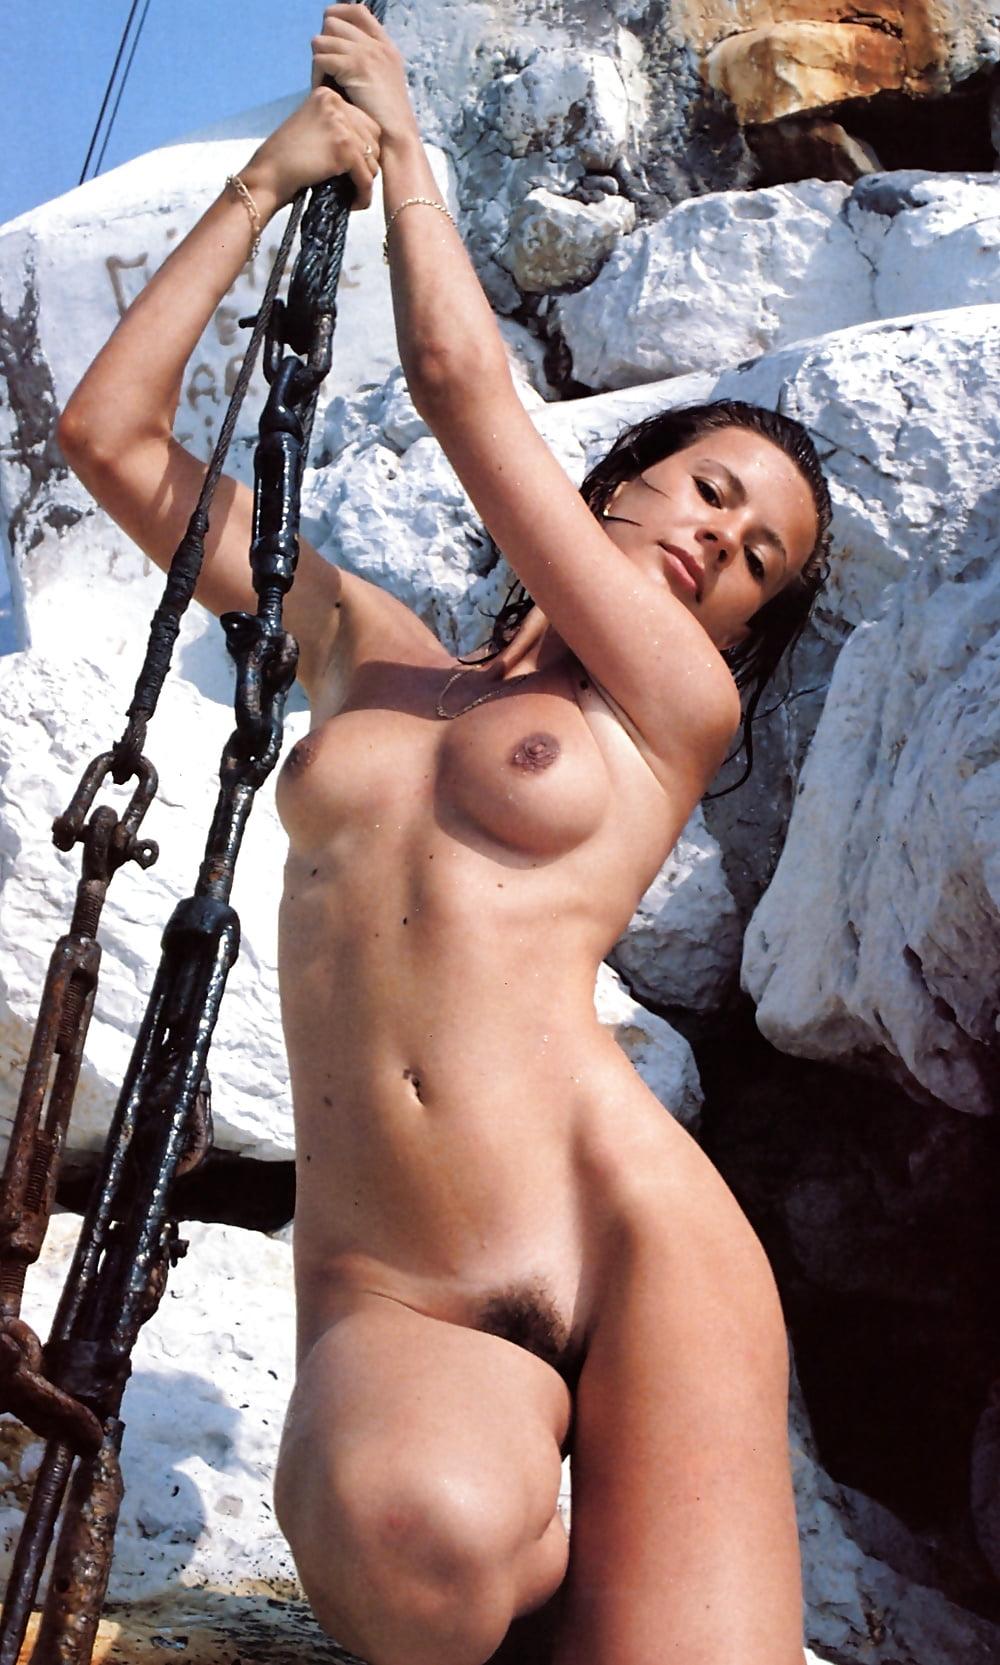 Virgin antonella elia nude guys like licking